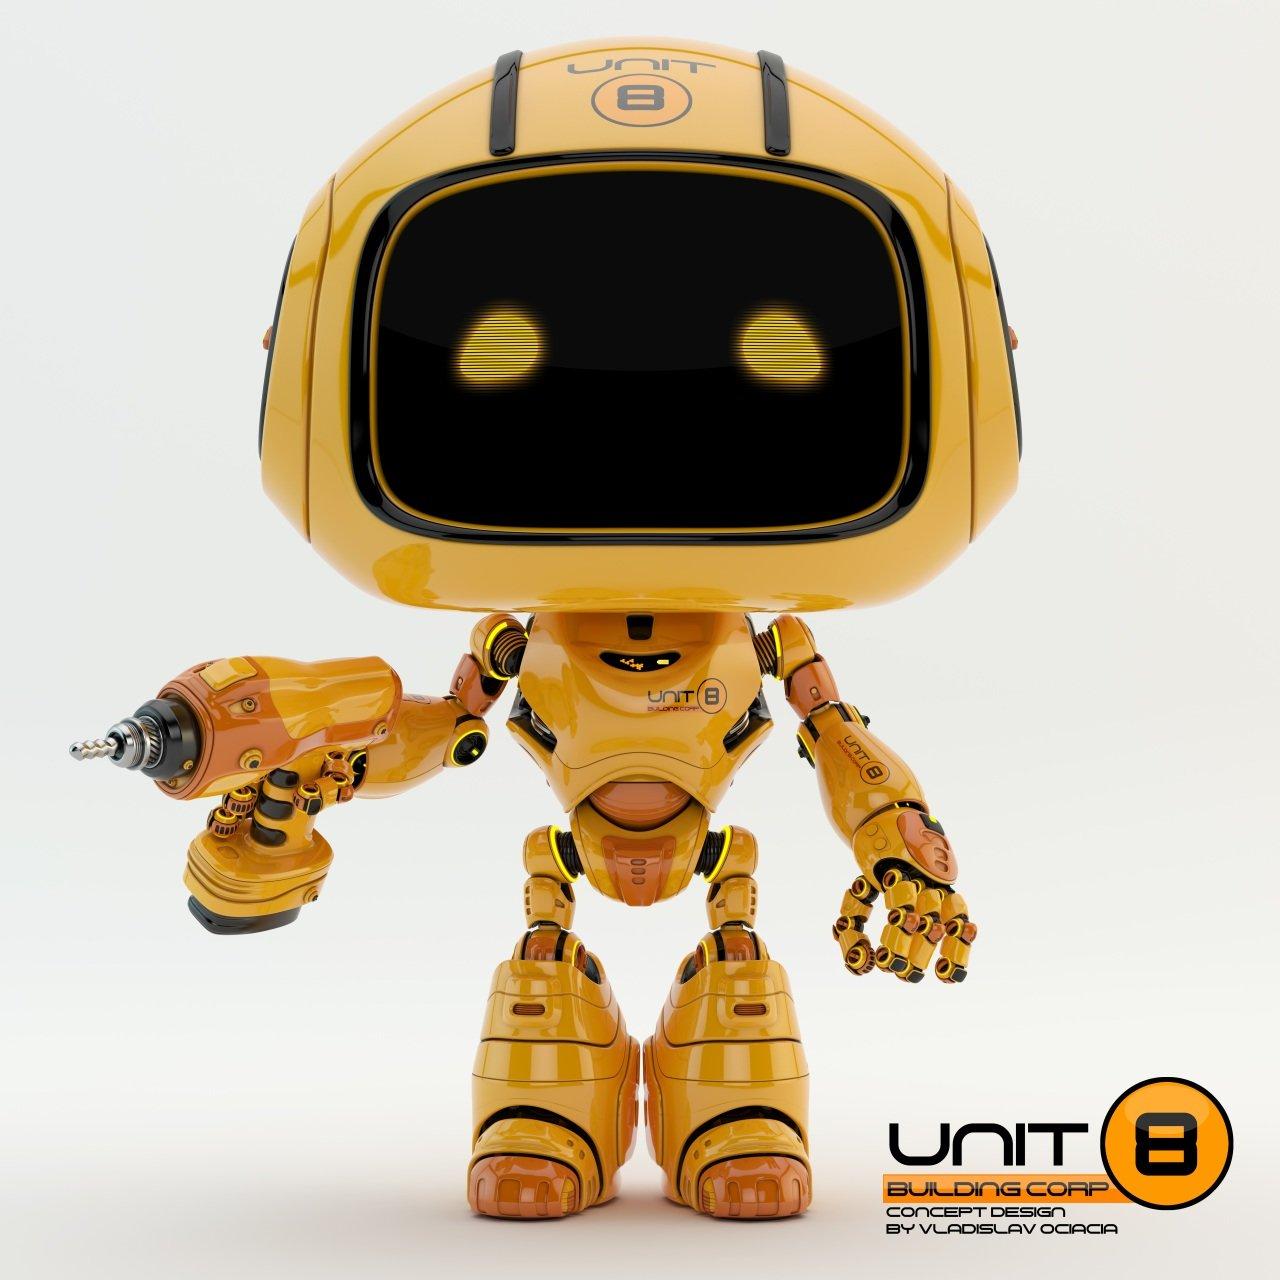 Vladislav ociacia team robot 2